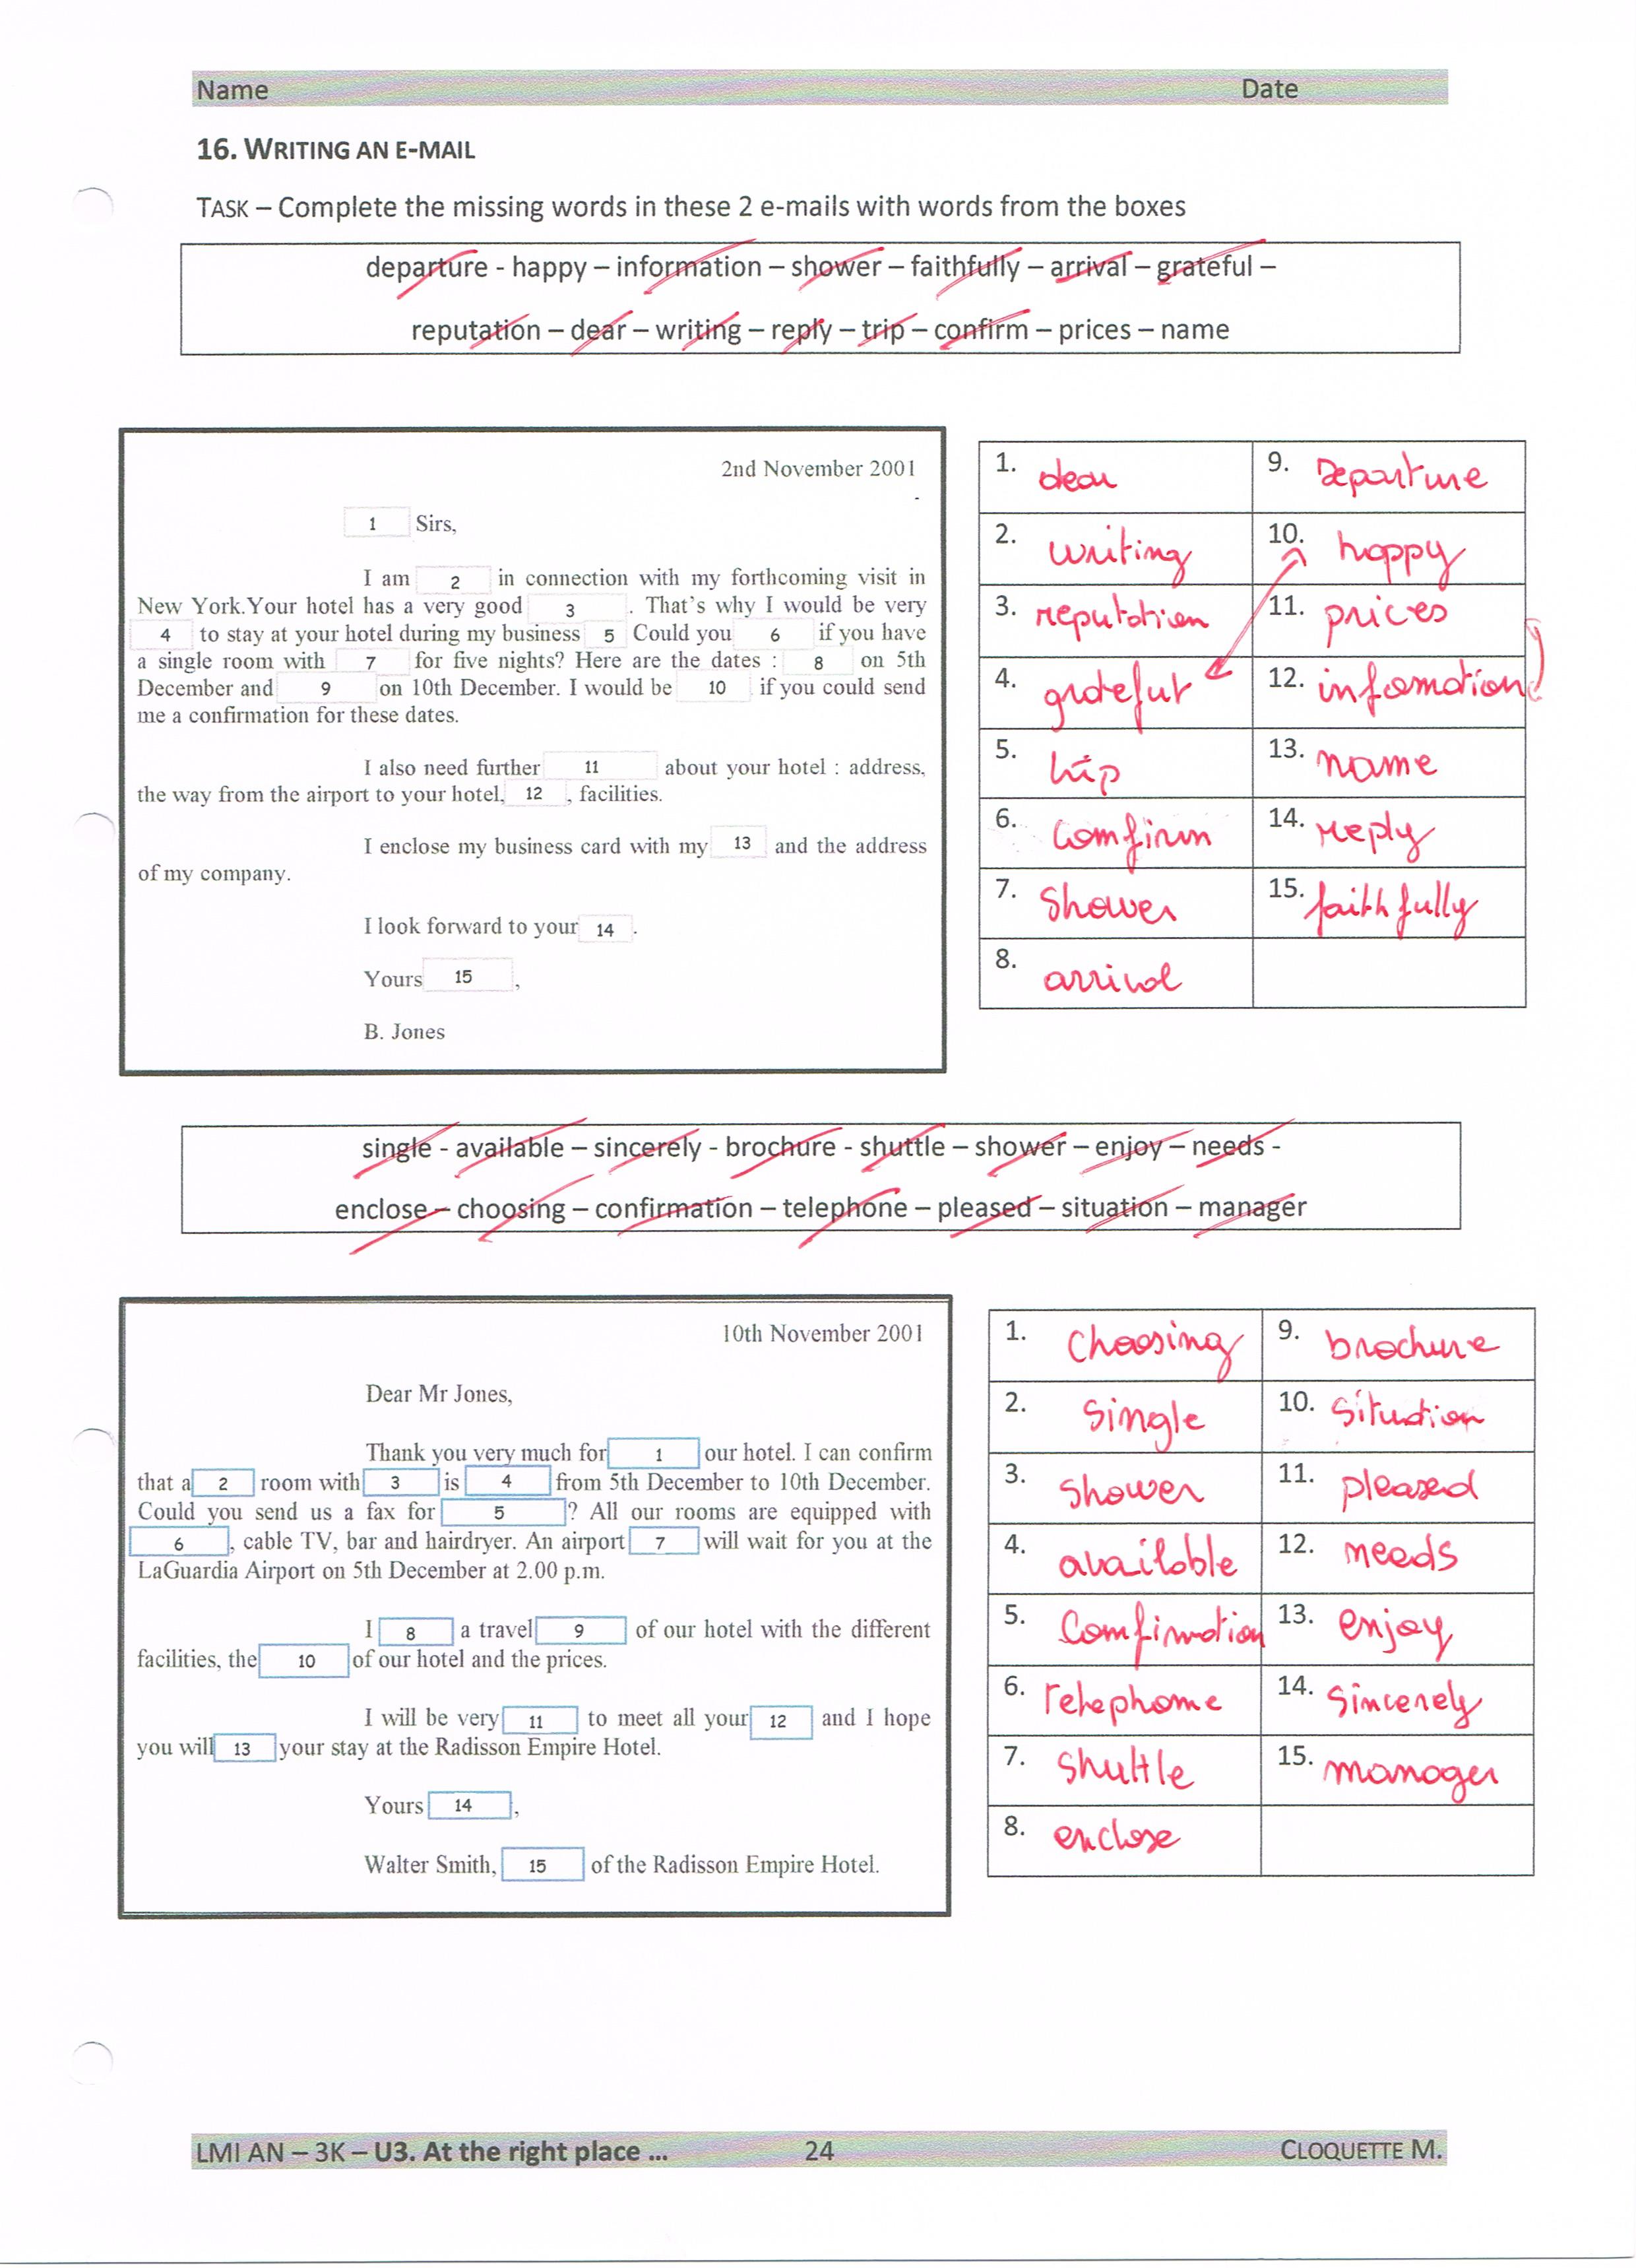 Correction P24